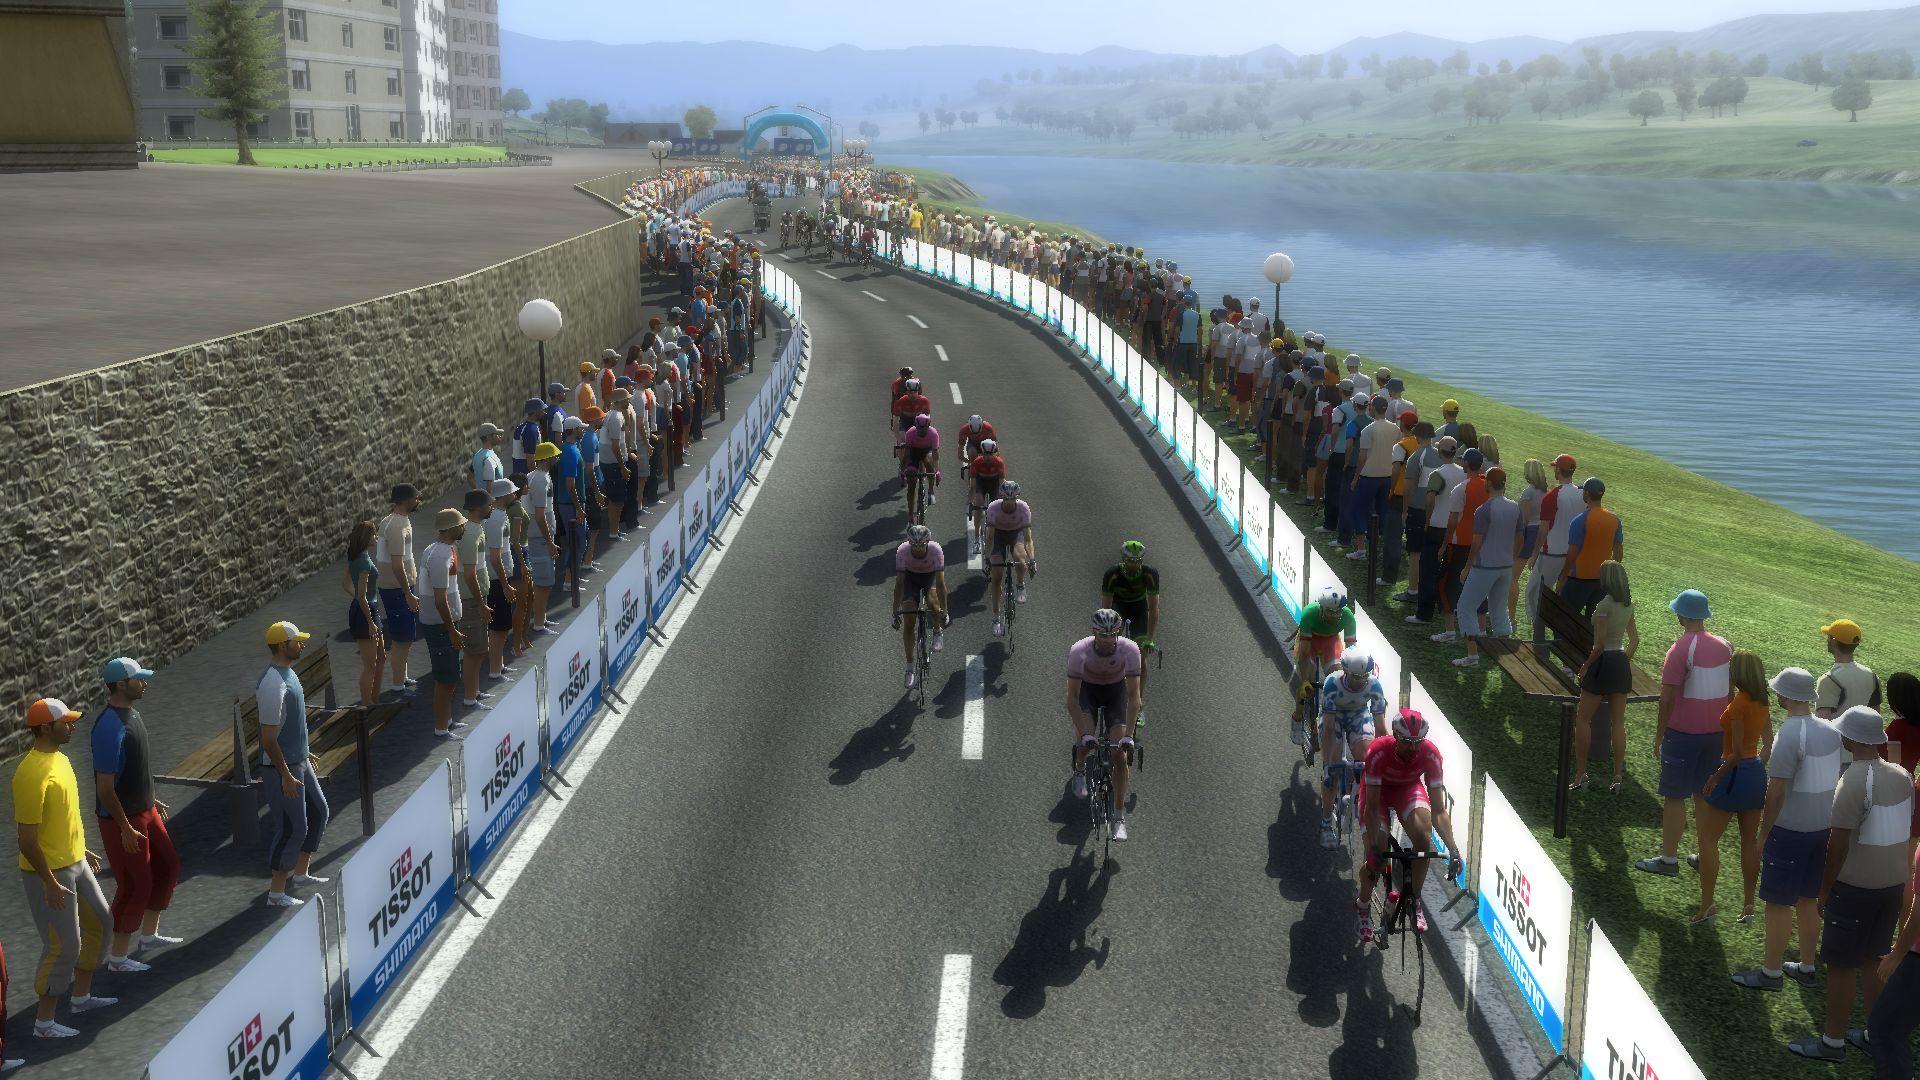 pcmdaily.com/images/mg/2018/Races/C2HC/Zuri/Zuri%2027.jpg